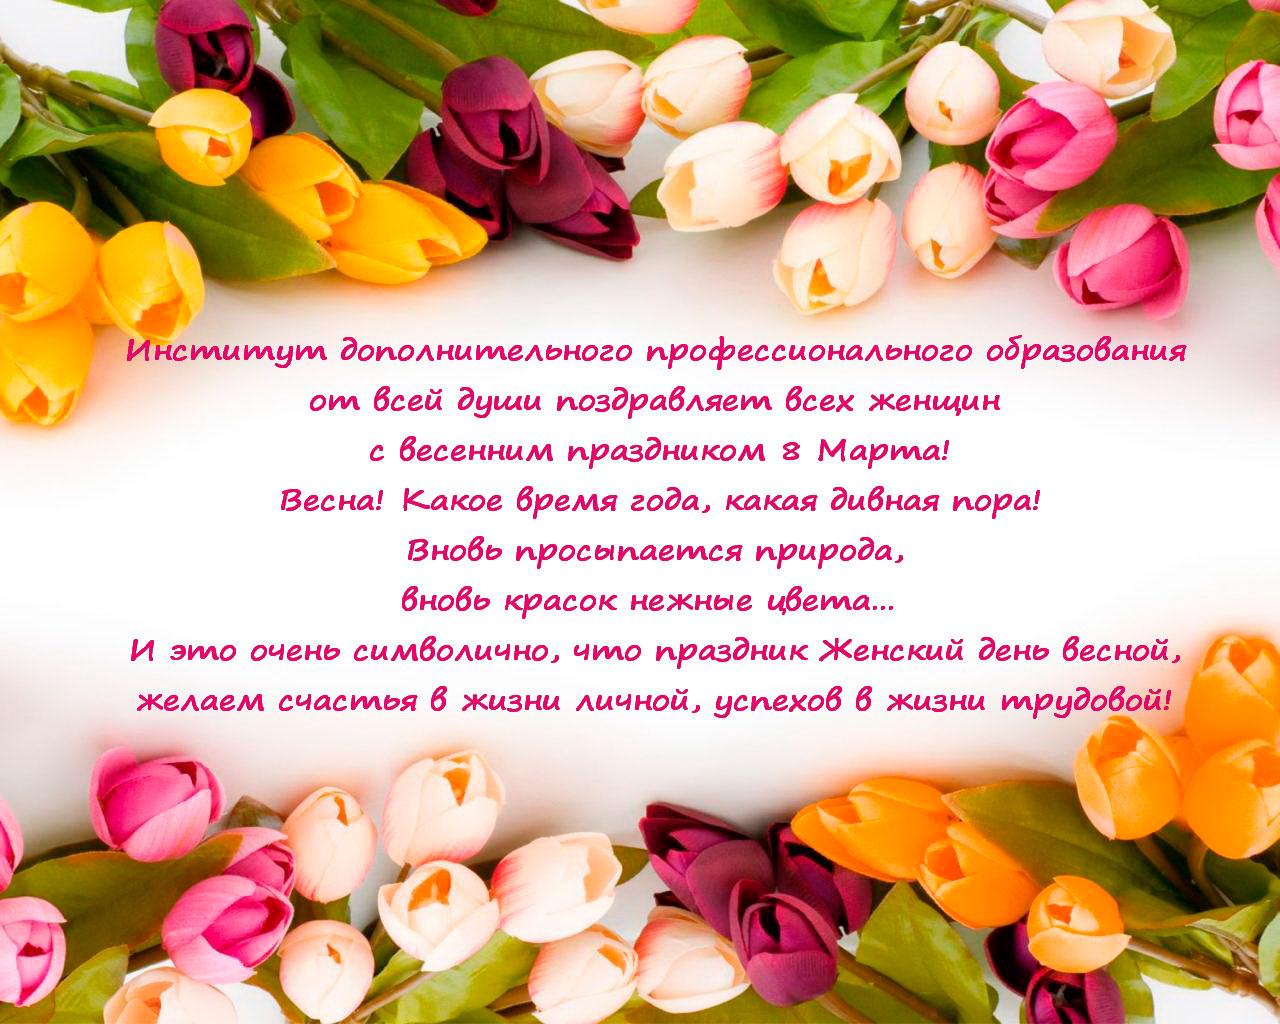 Поздравление с 8 марта от ИДПО